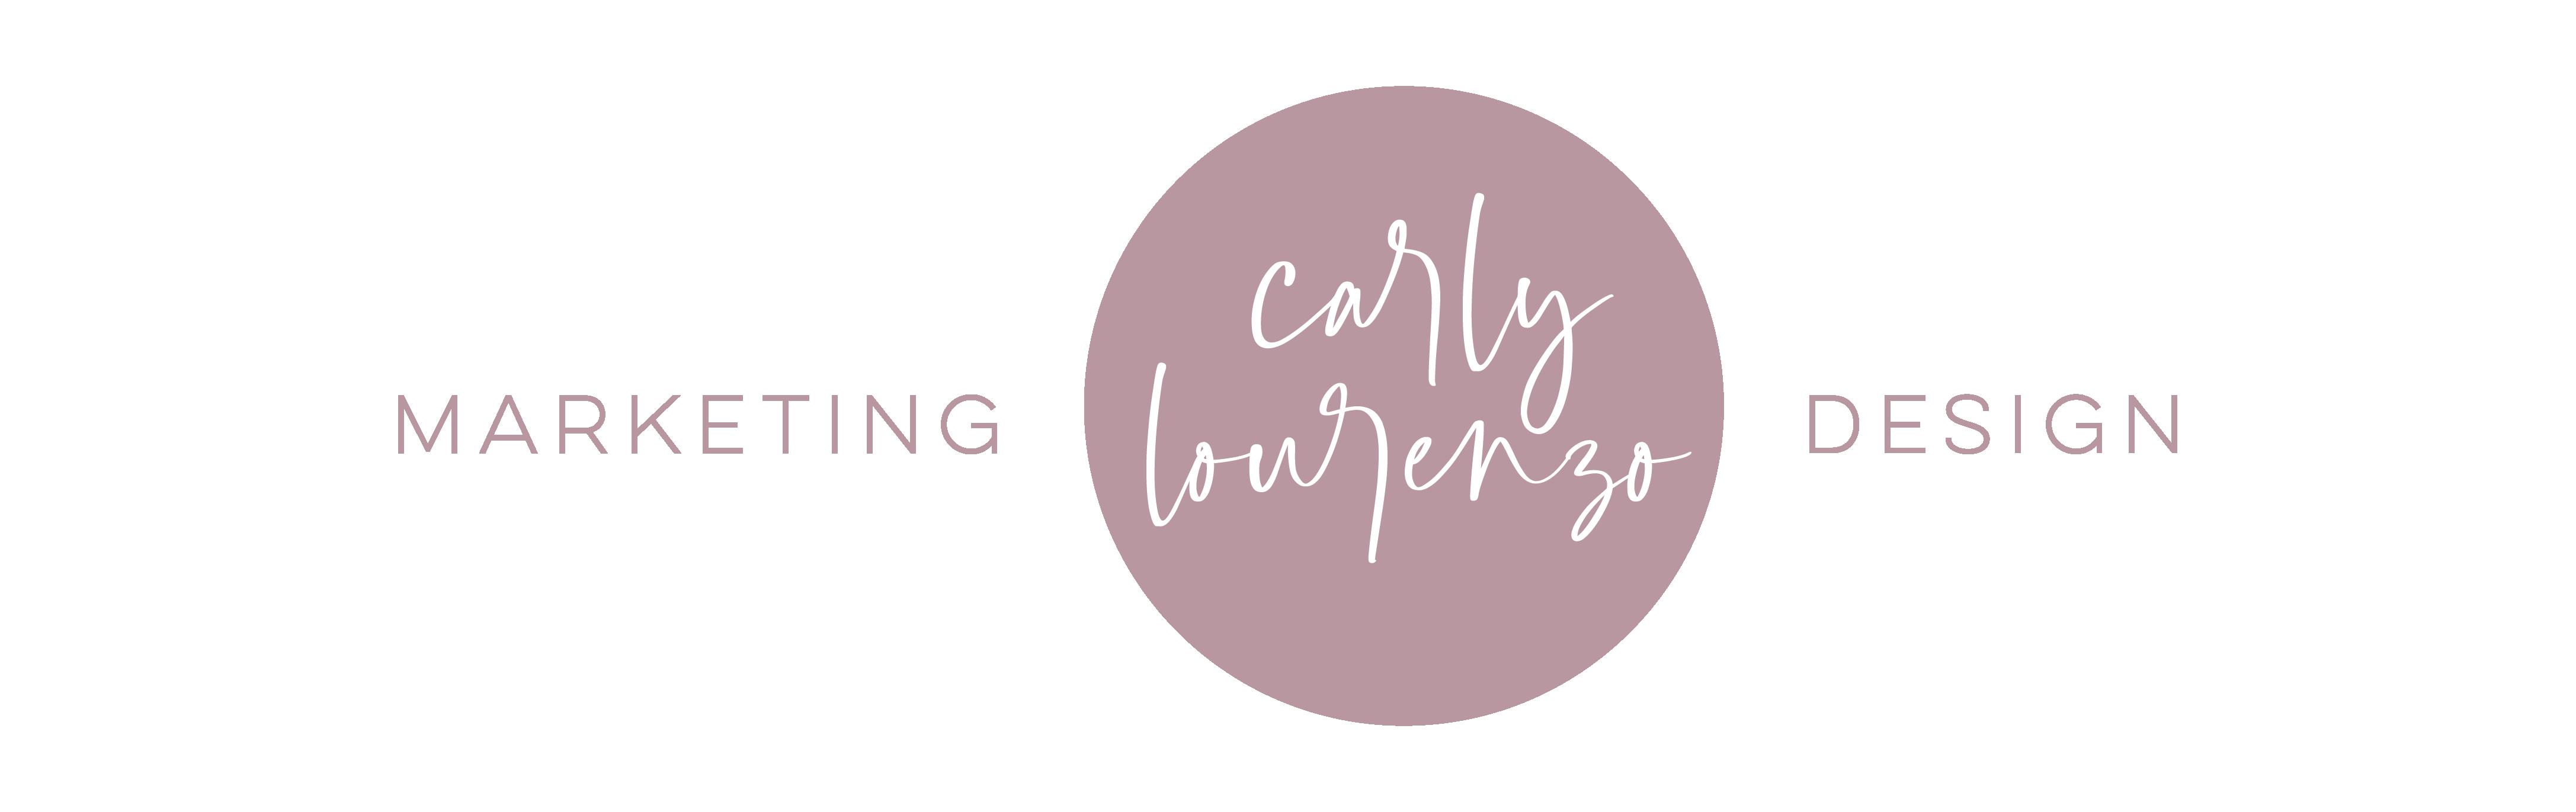 Carly Lourenzo